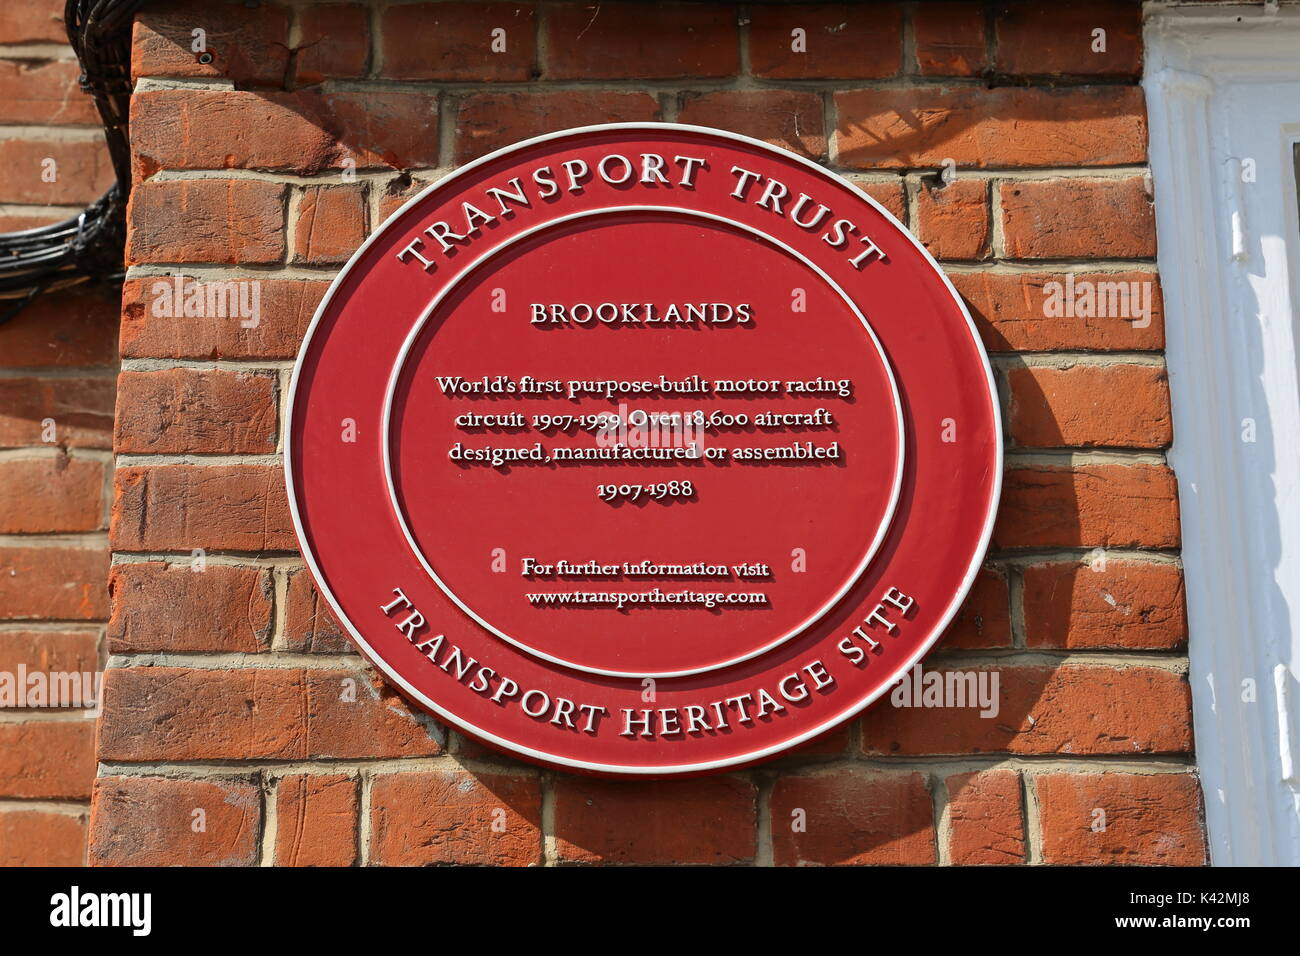 Transport Weltkulturerbe Plakette, Klubhaus, Brooklands Museum, Weybridge, Surrey, England, Großbritannien, USA, UK, Europa Stockbild